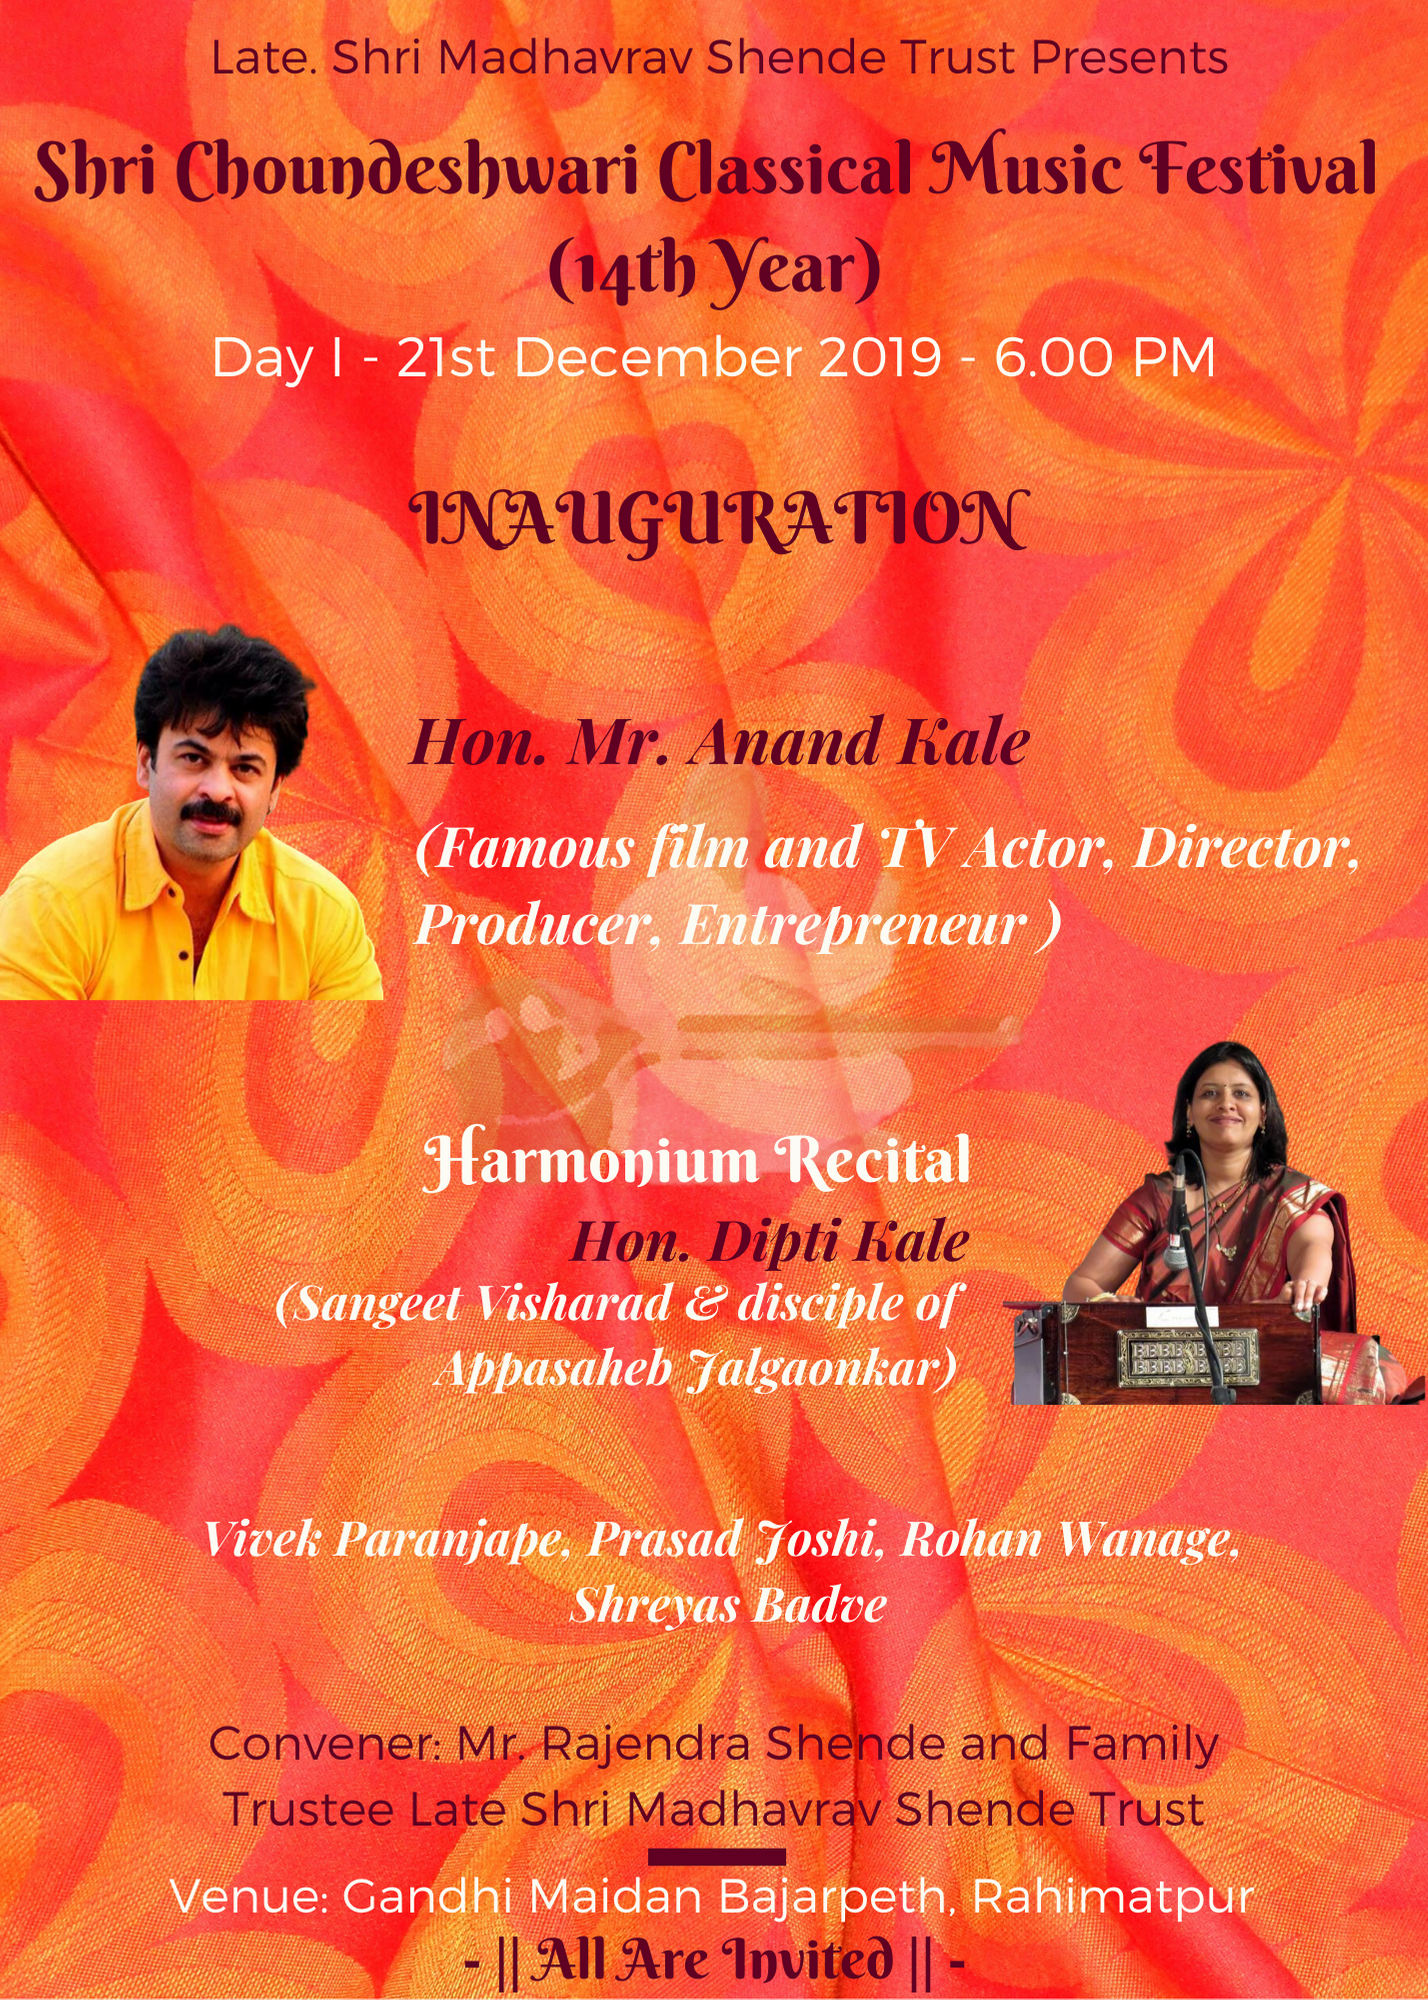 RS - Shri Choundeshwari Classical Music Festival 2019 - Invitation Day 1